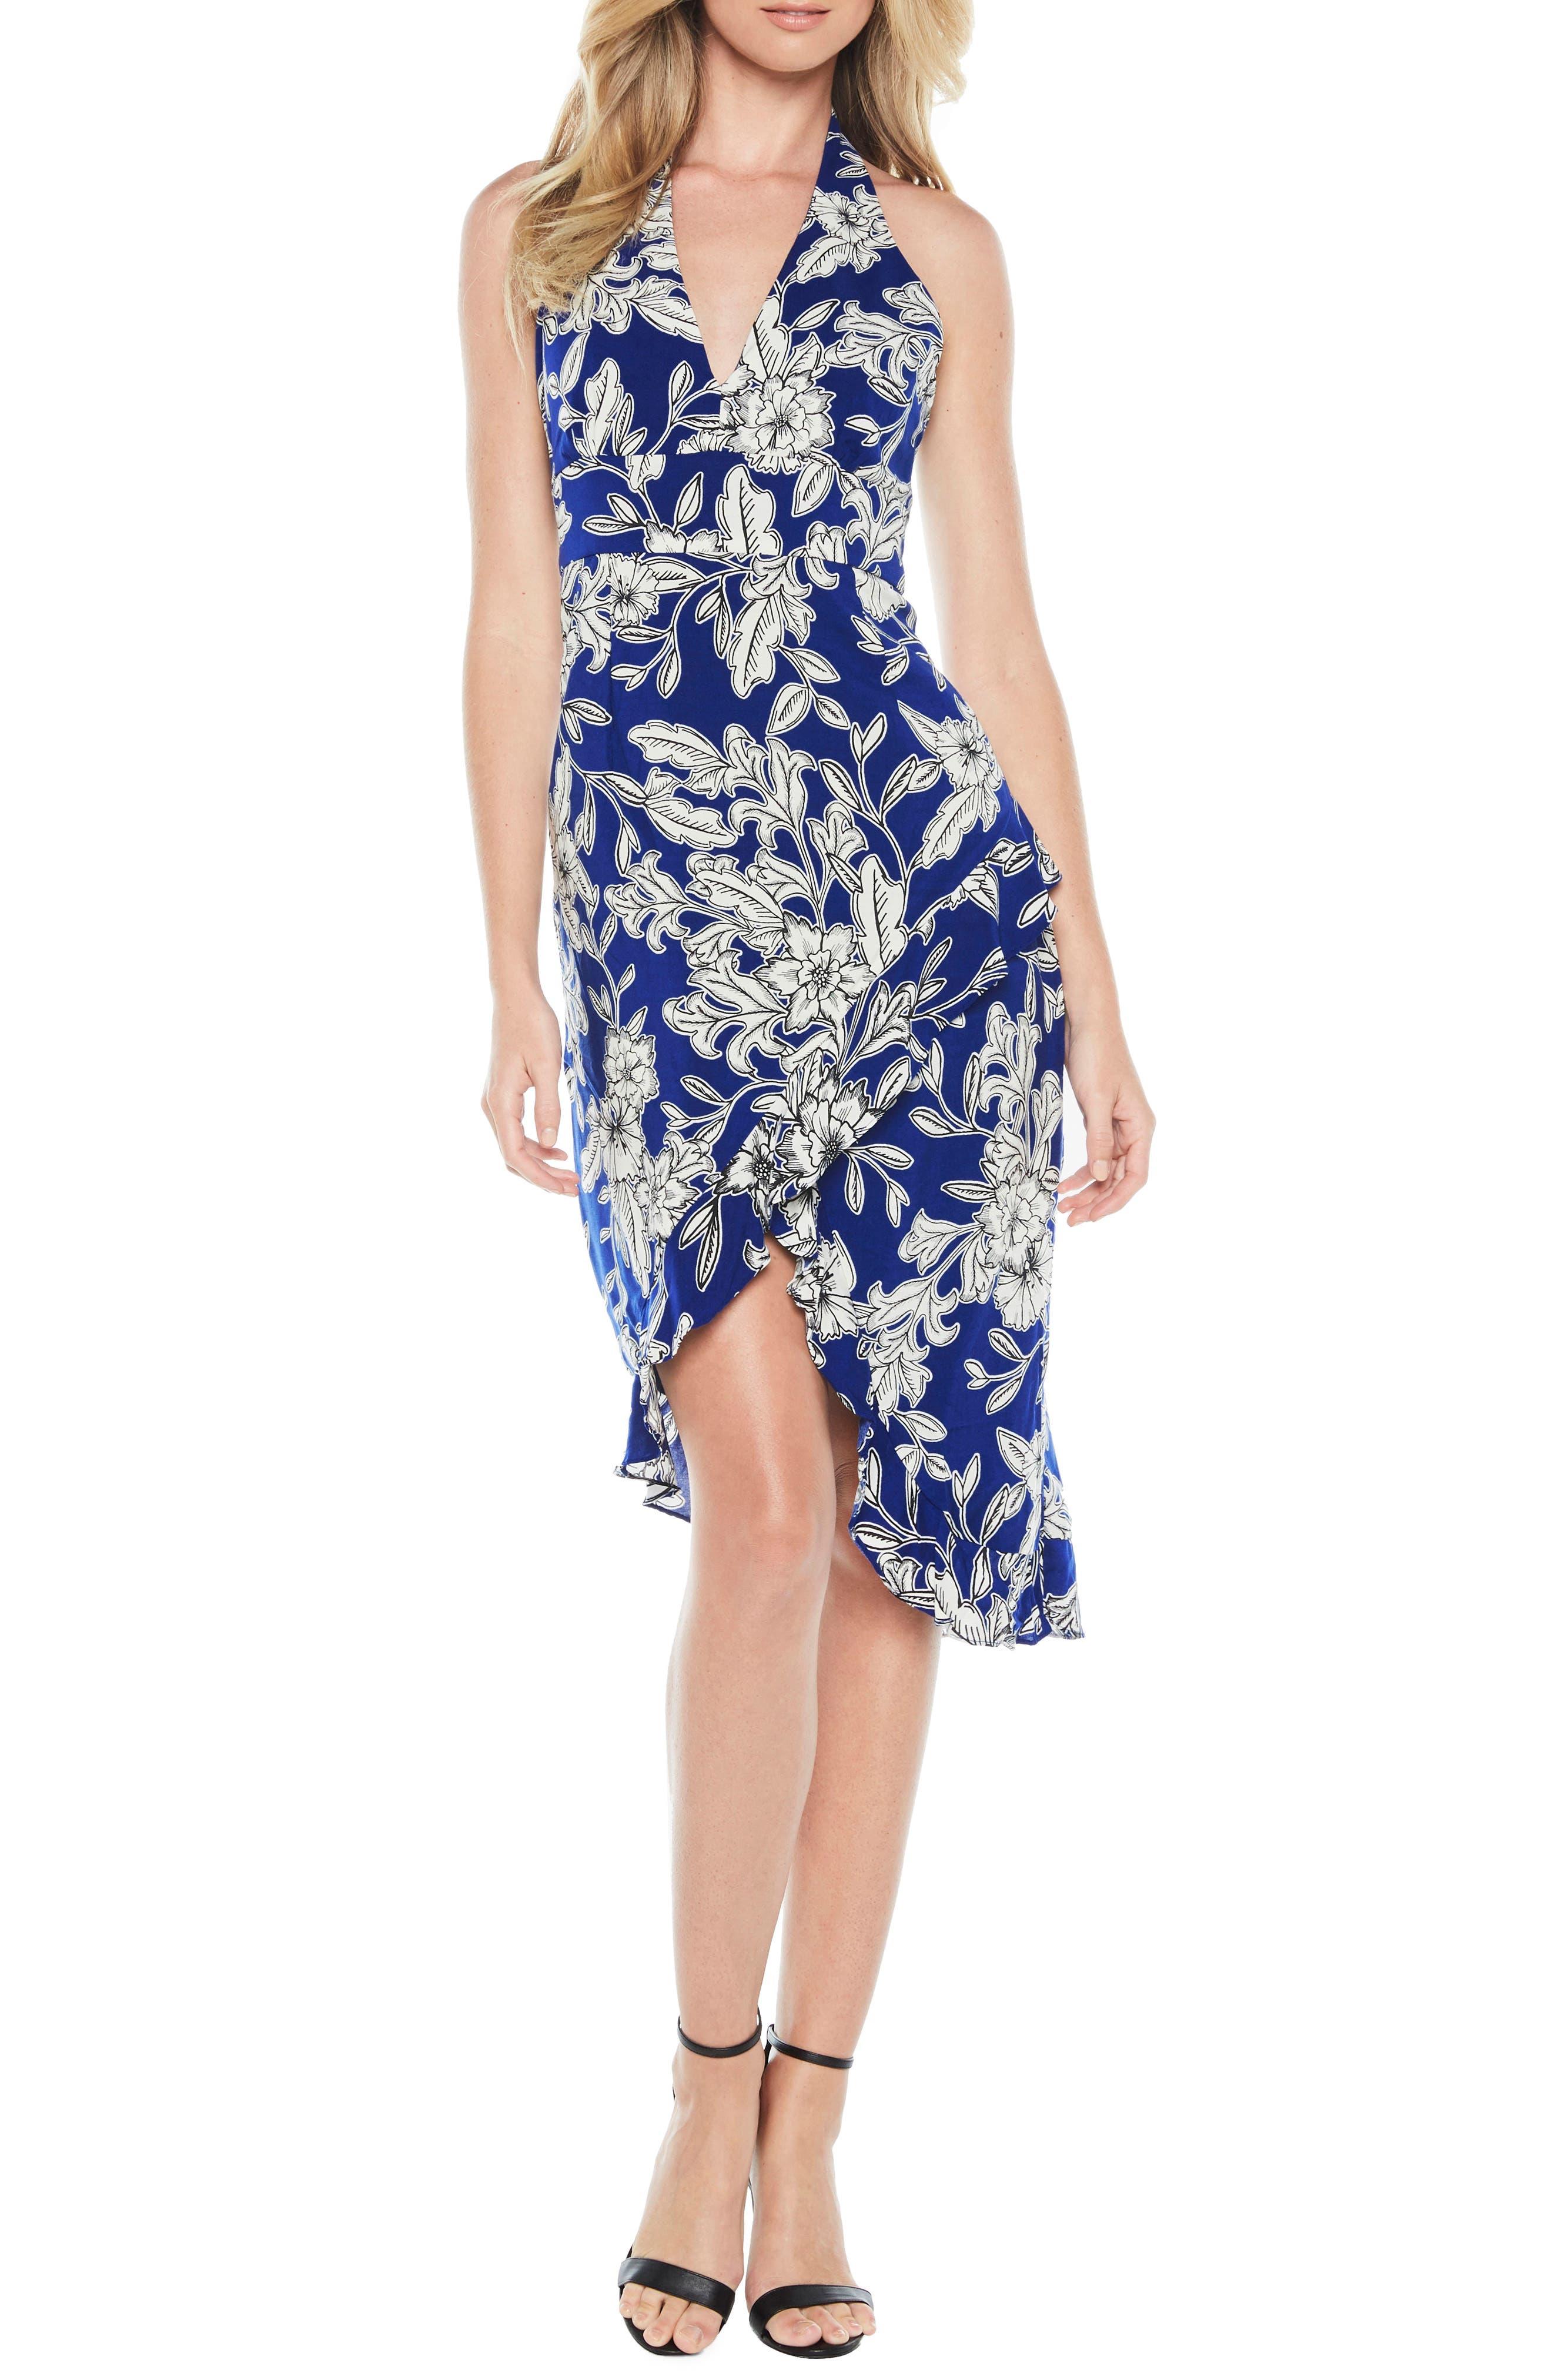 Petra Floral Dress,                         Main,                         color, 493